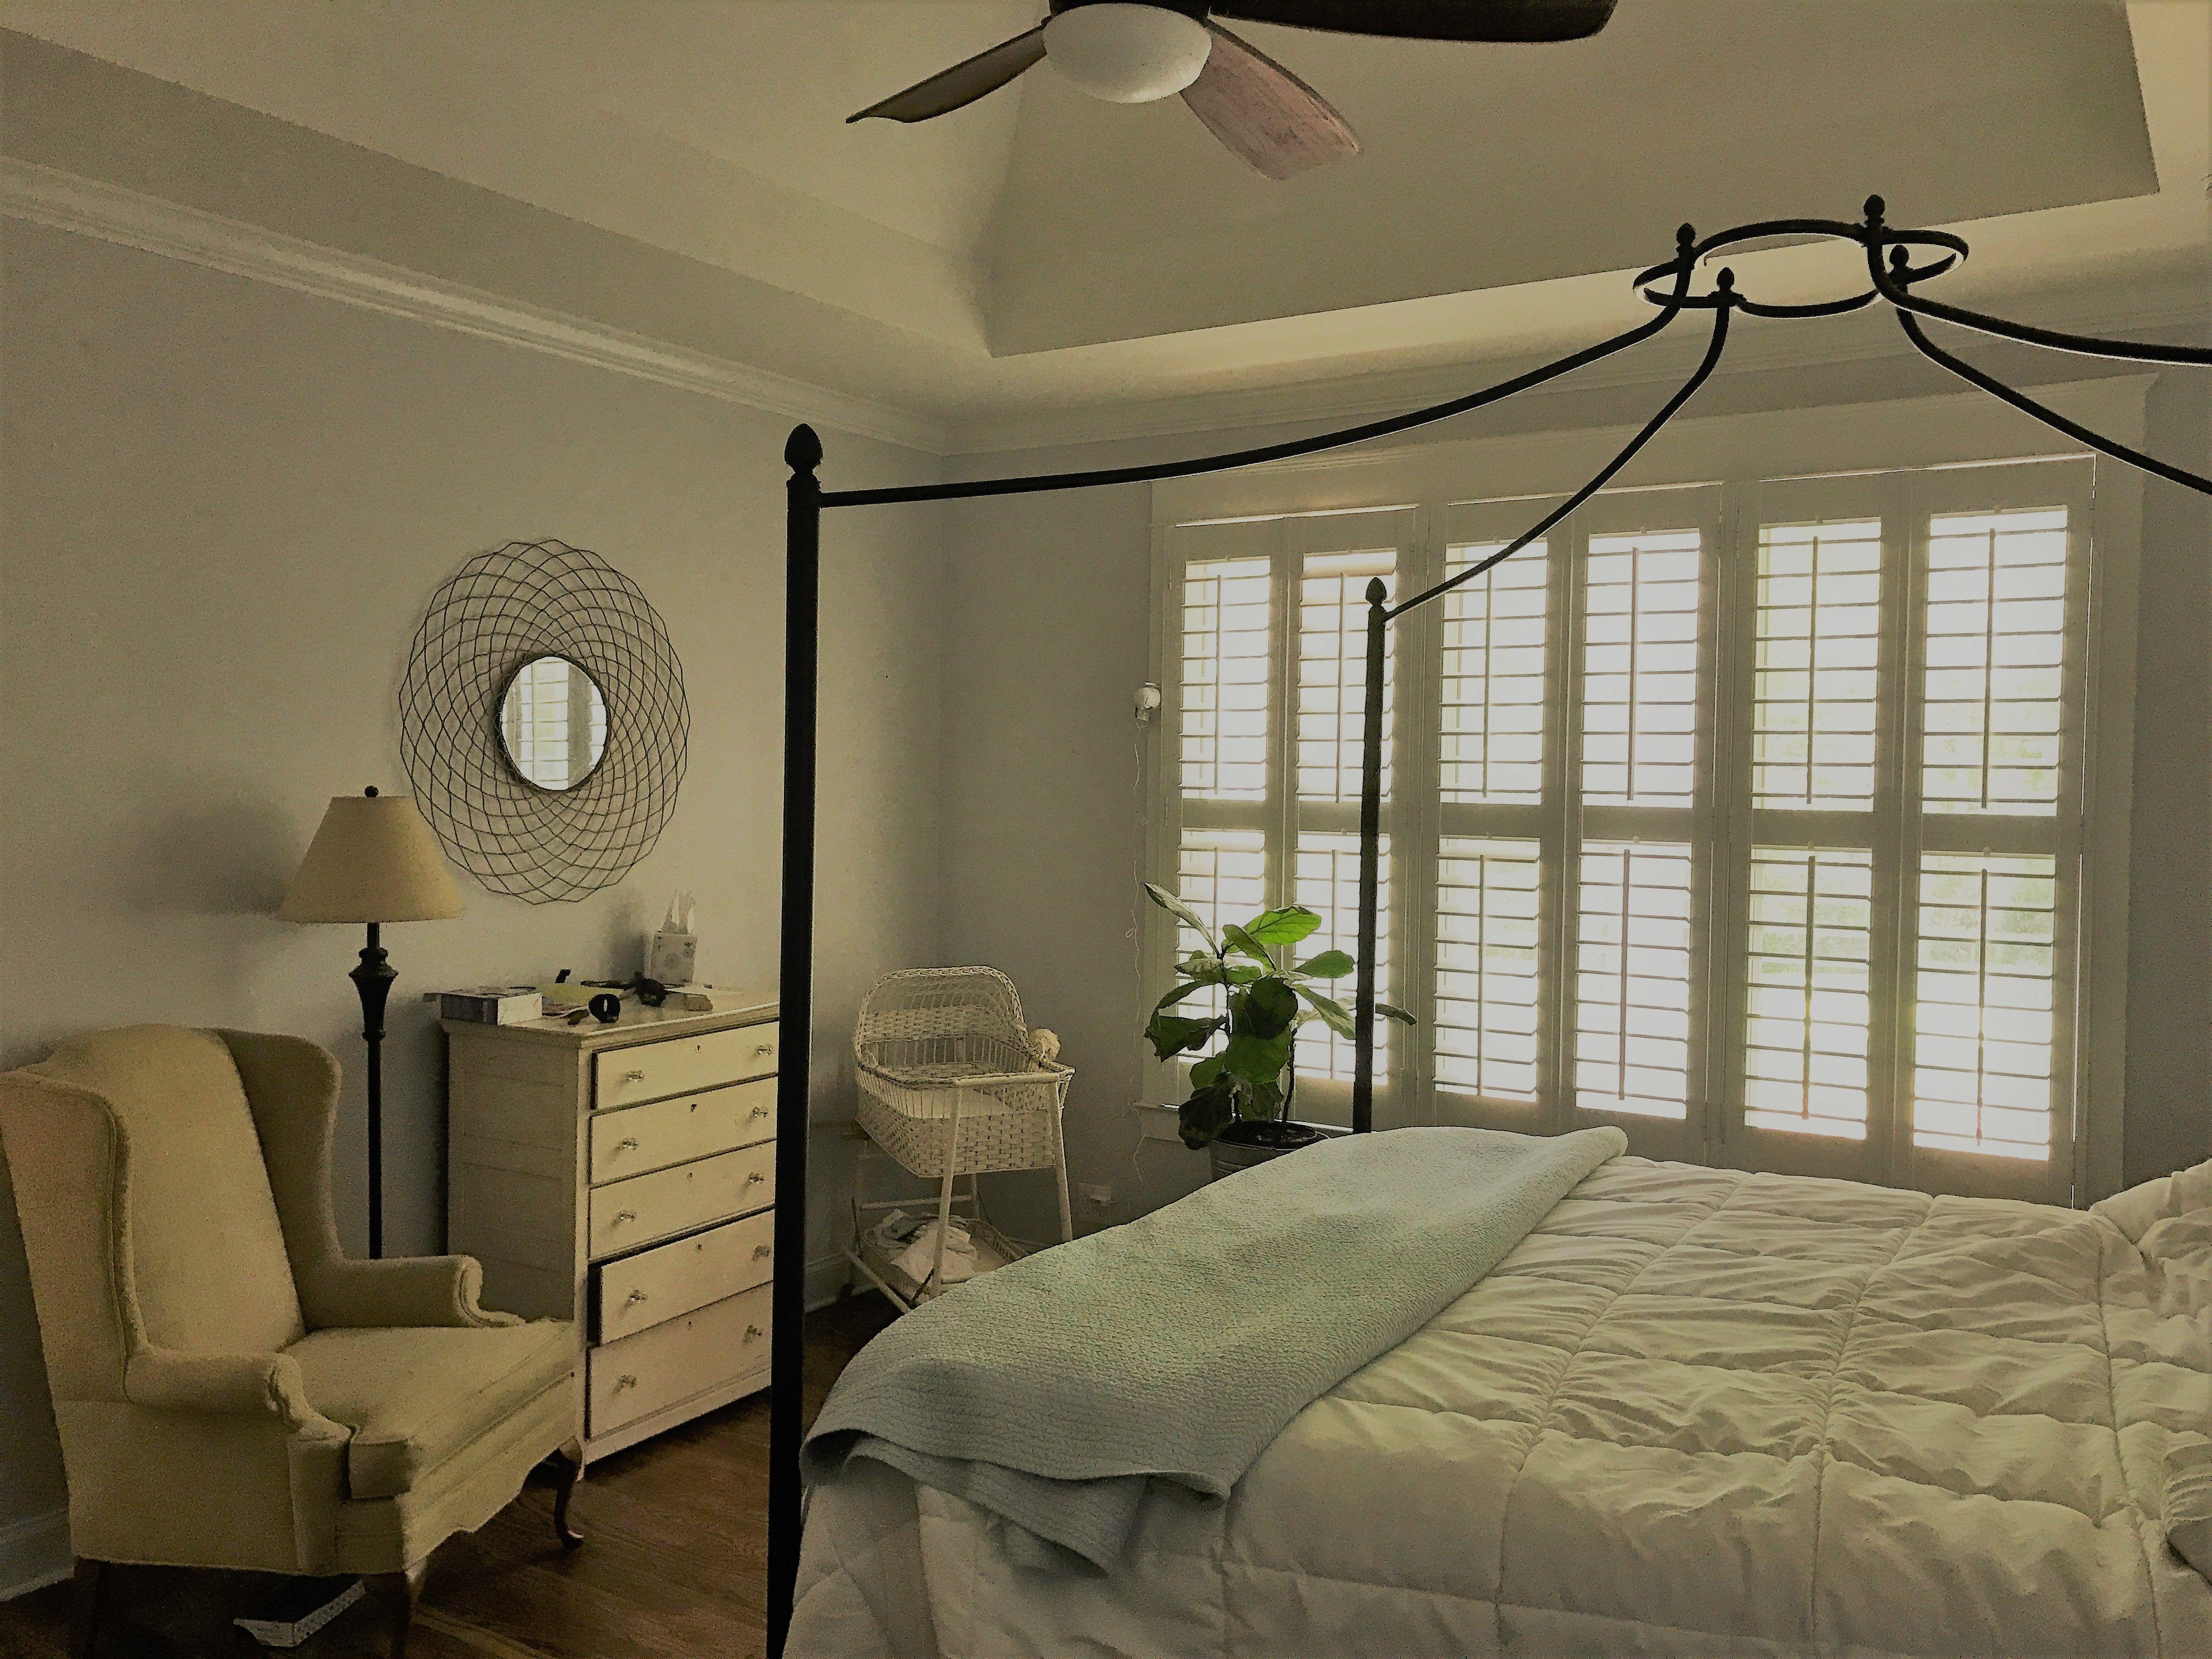 Castleberry custom shutters installed in the master bedroom shared